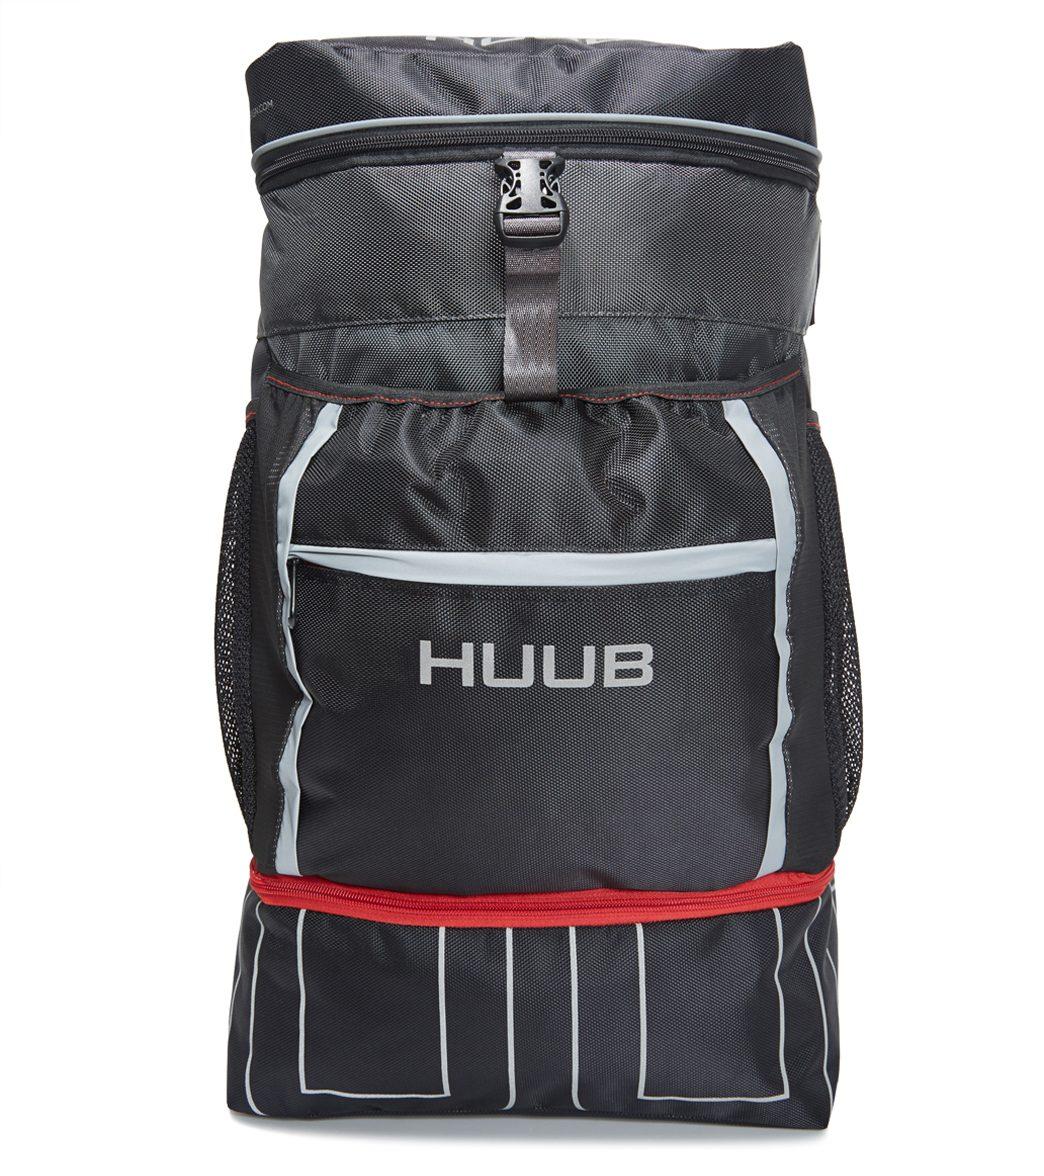 Huub Transition Rucksack - Black/Red - Swimoutlet.com